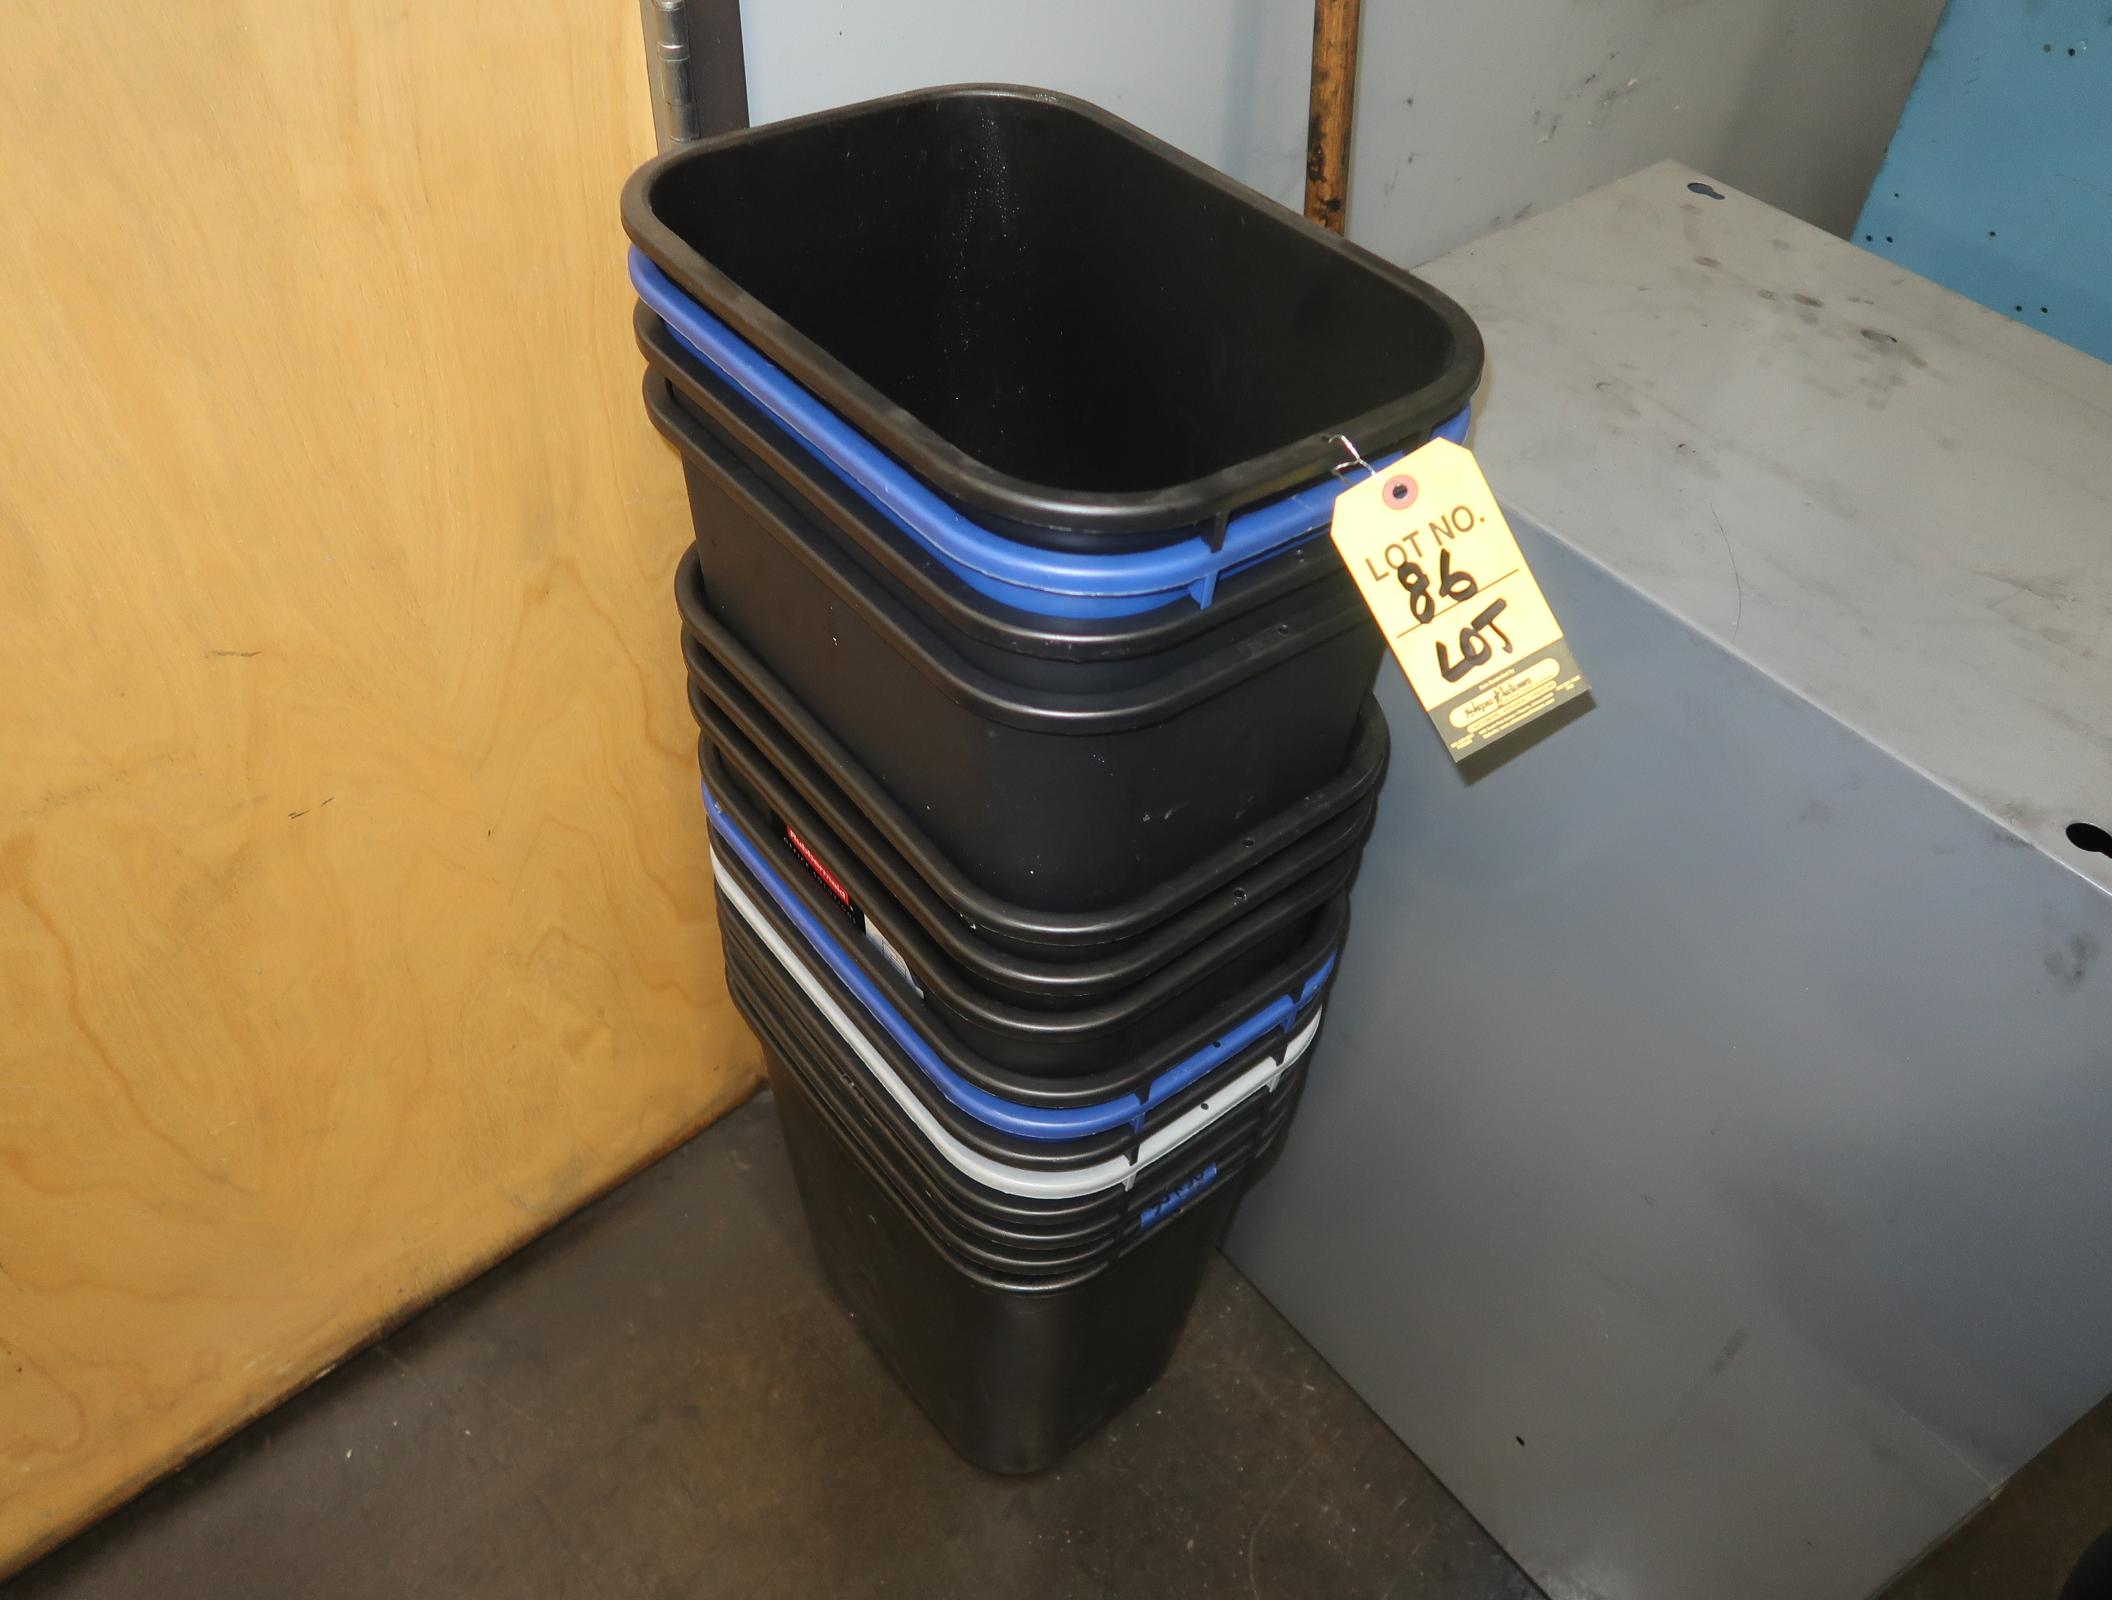 LOT TRASH CANS